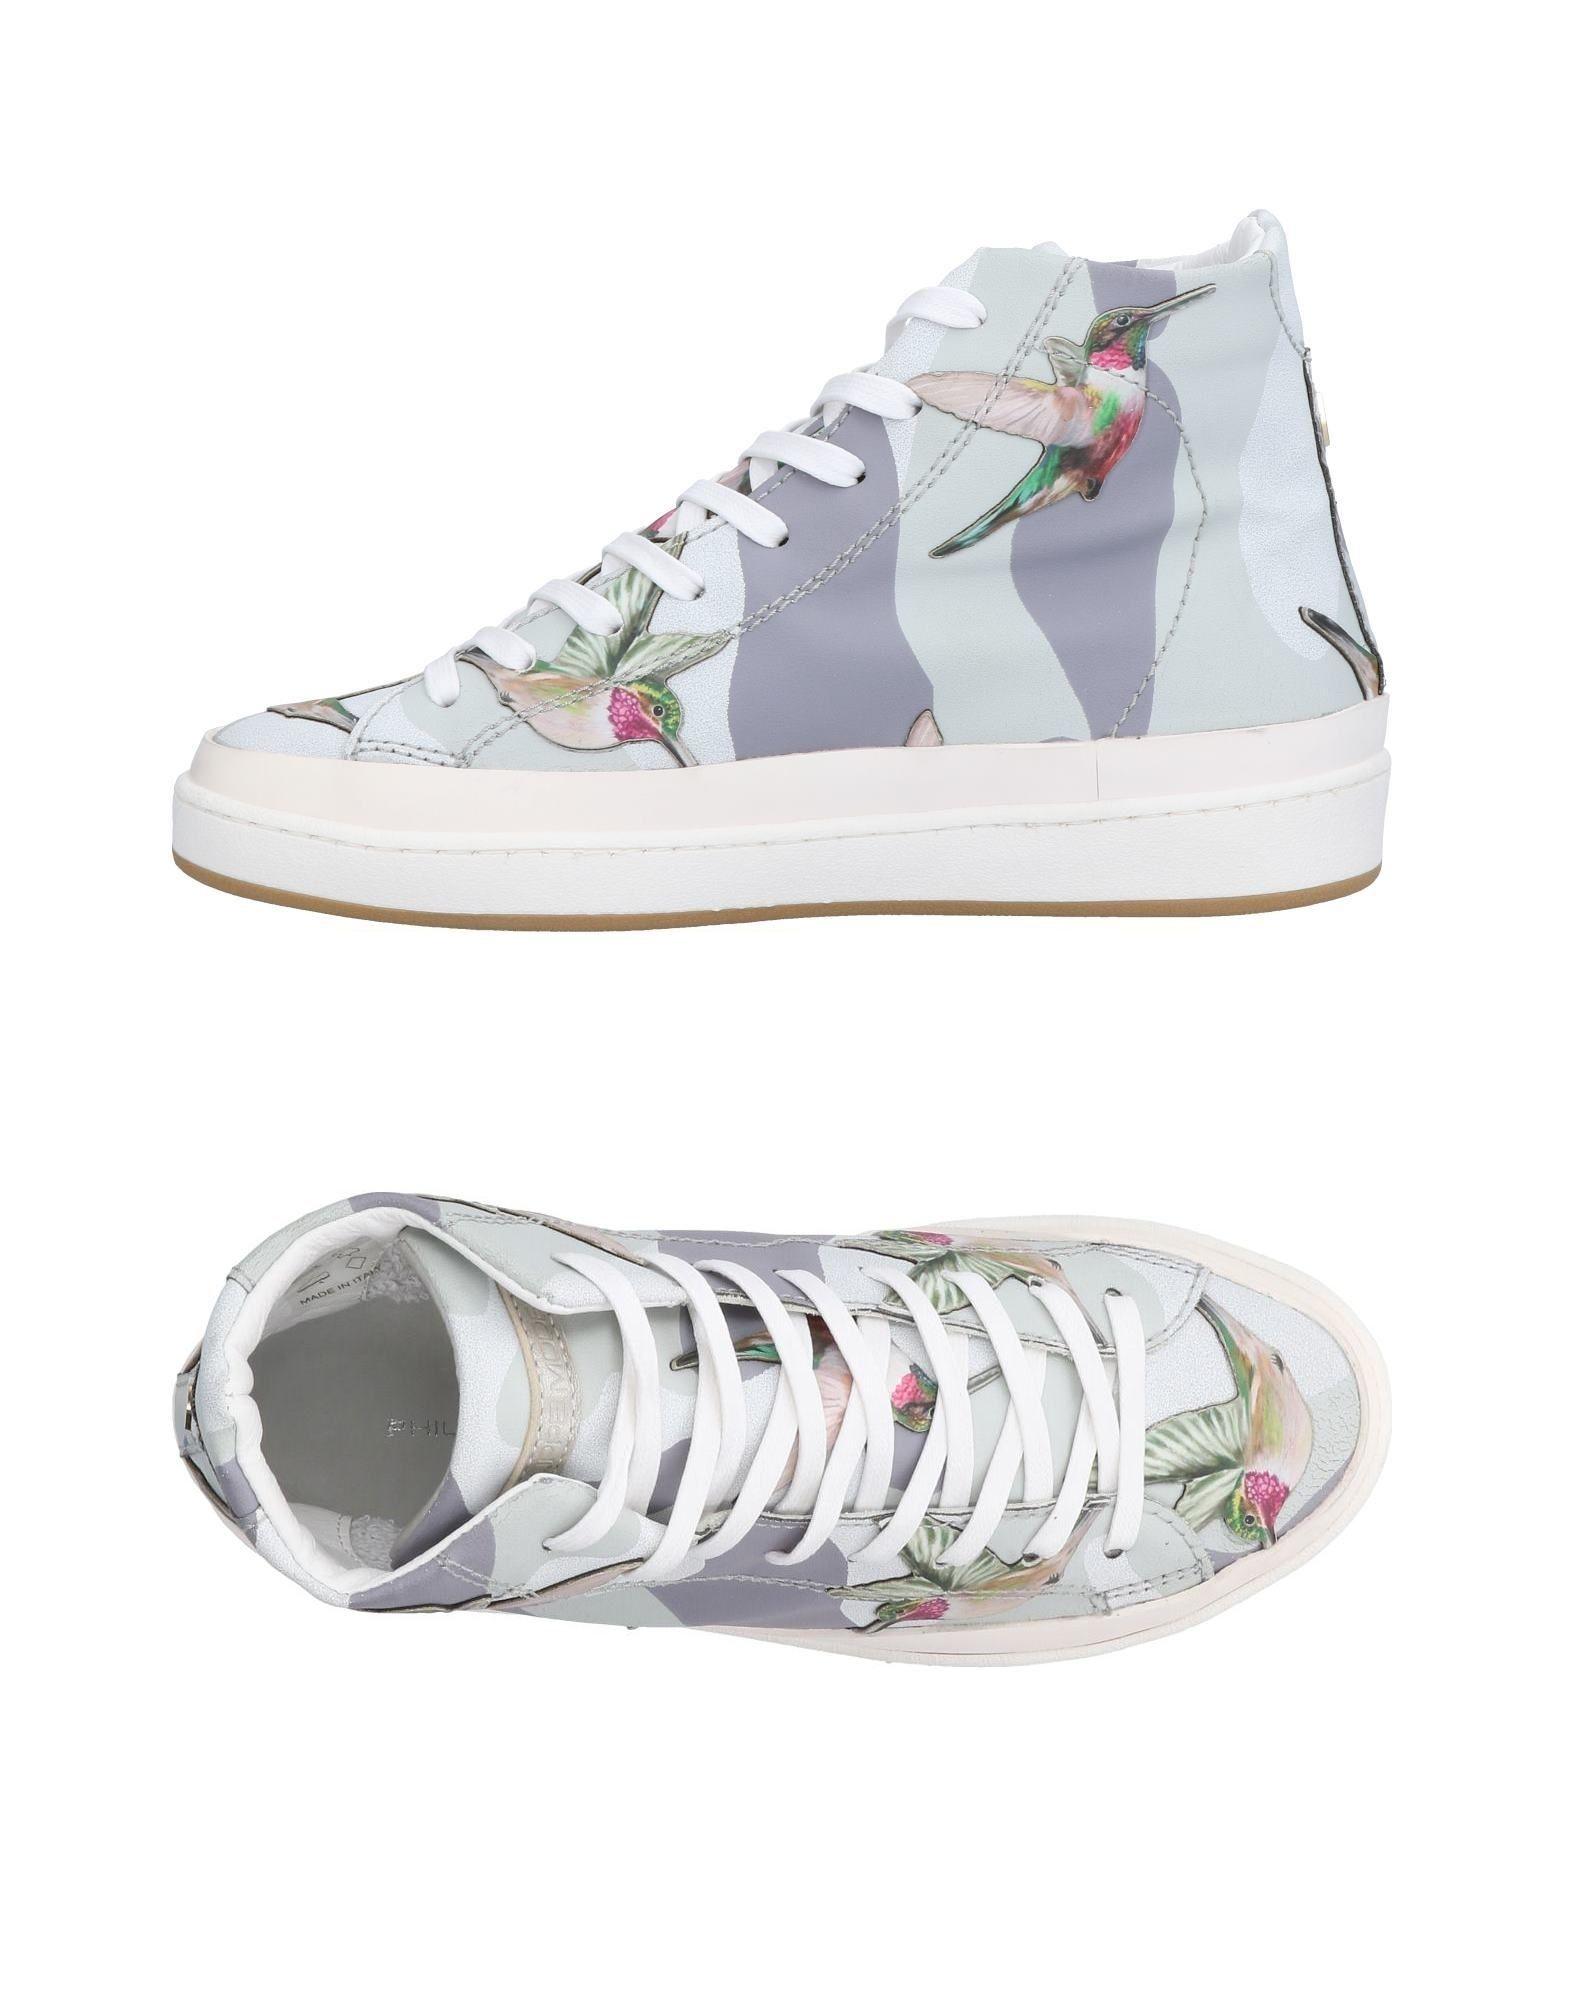 Rabatt Schuhe Philippe 11478633RC Model Sneakers Damen  11478633RC Philippe fc51df